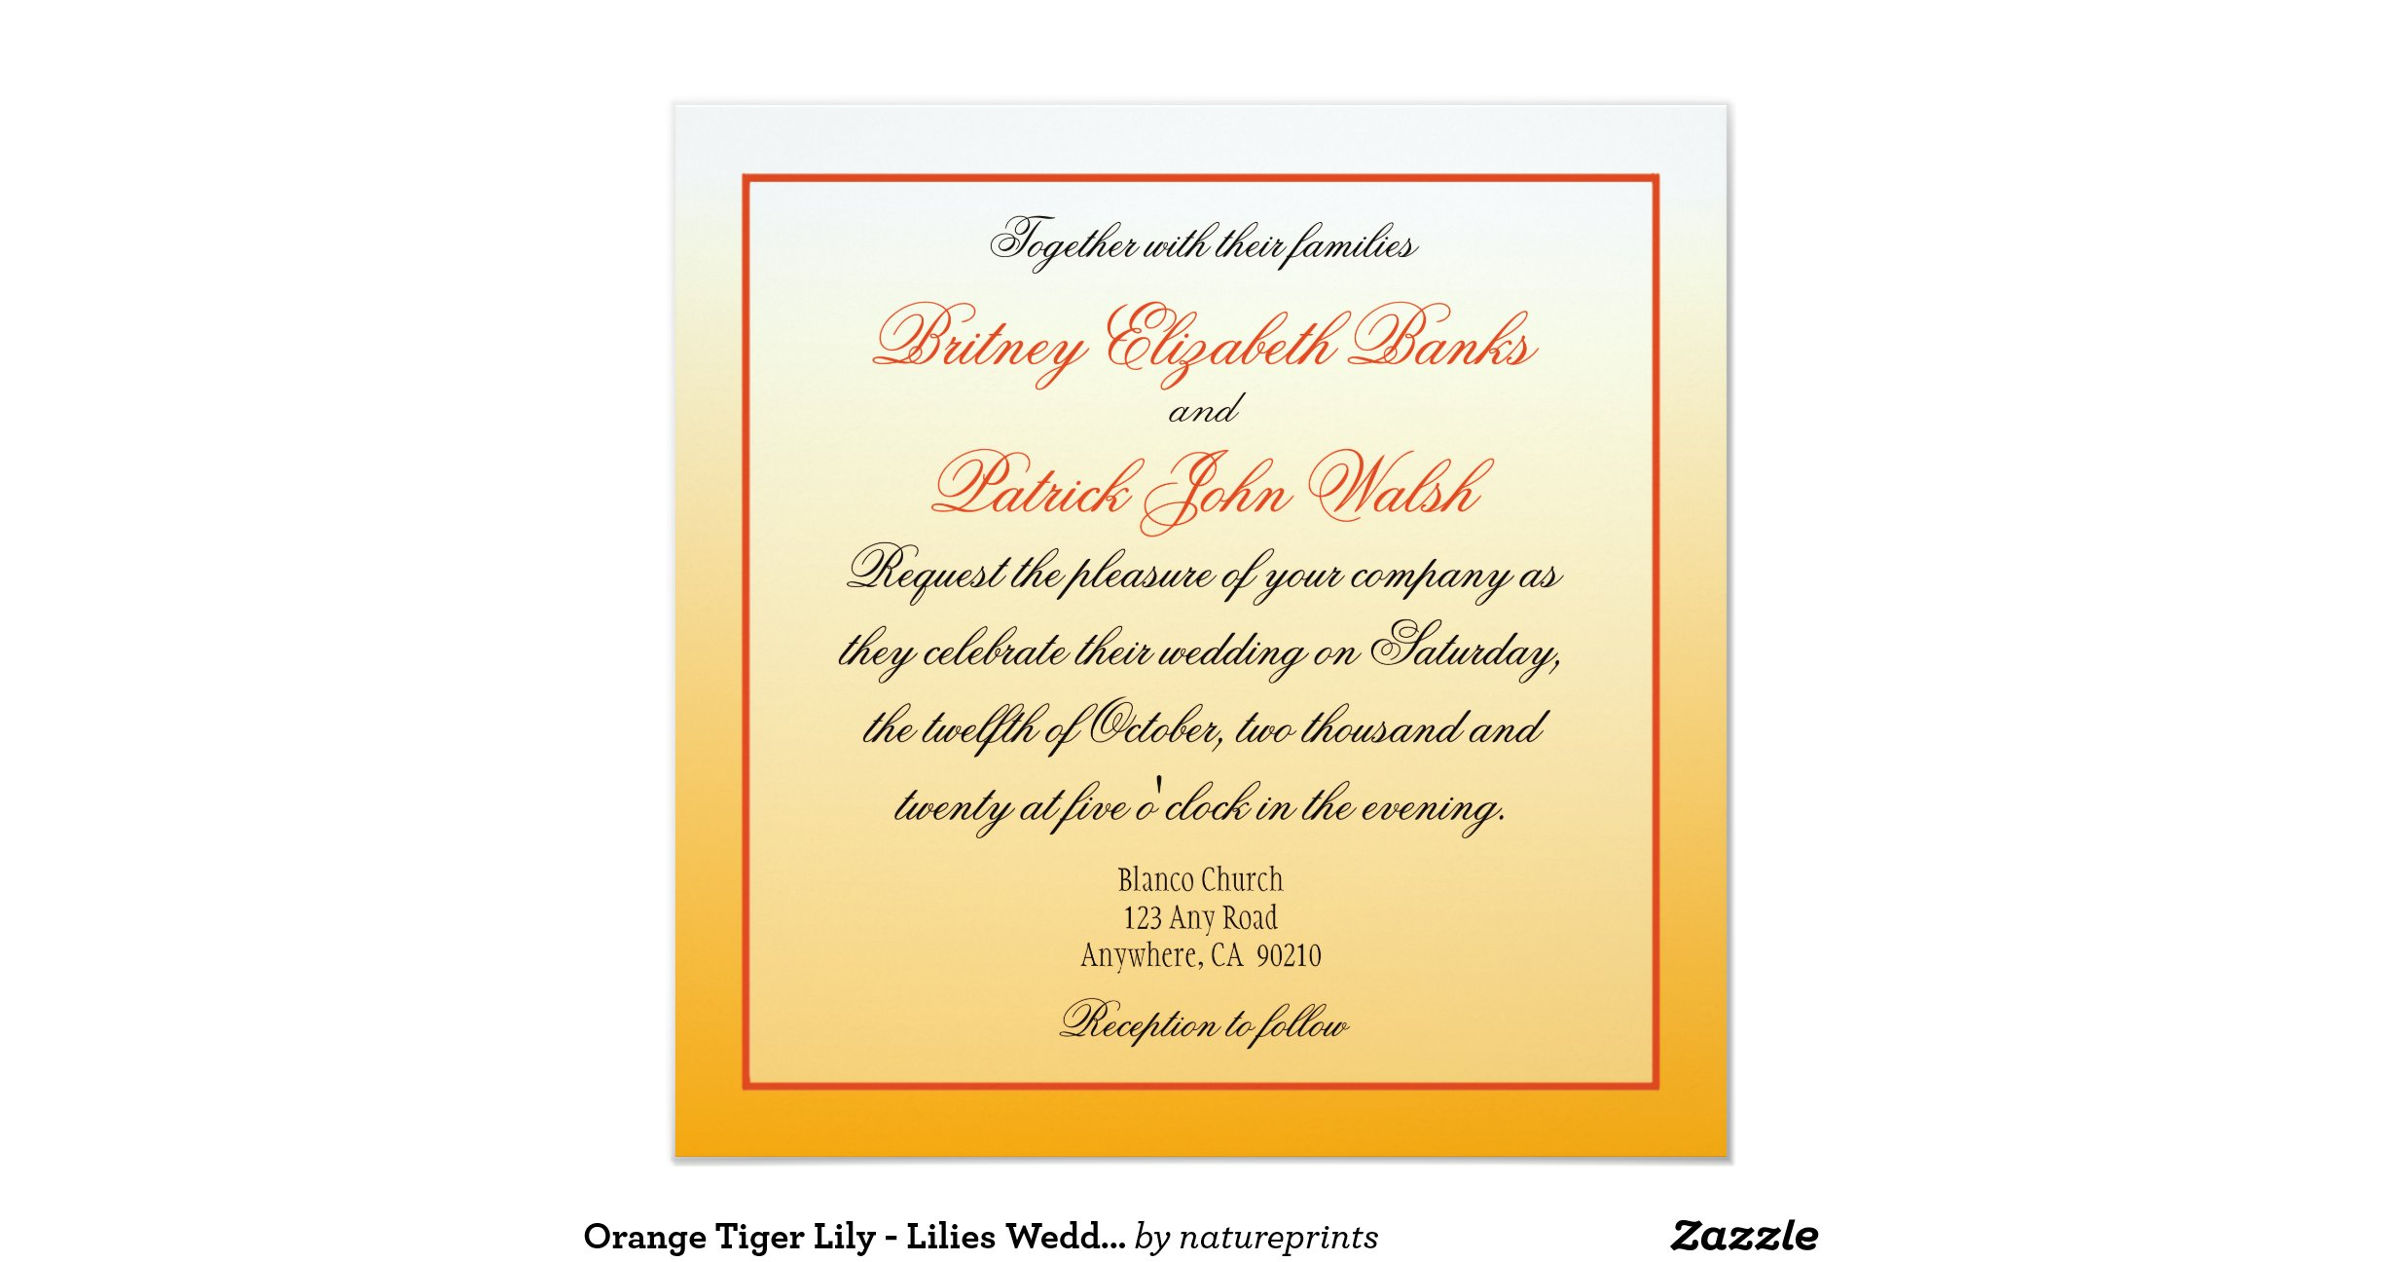 tiger wedding invitations ideas - 28 images - vintage tiger lilies ...